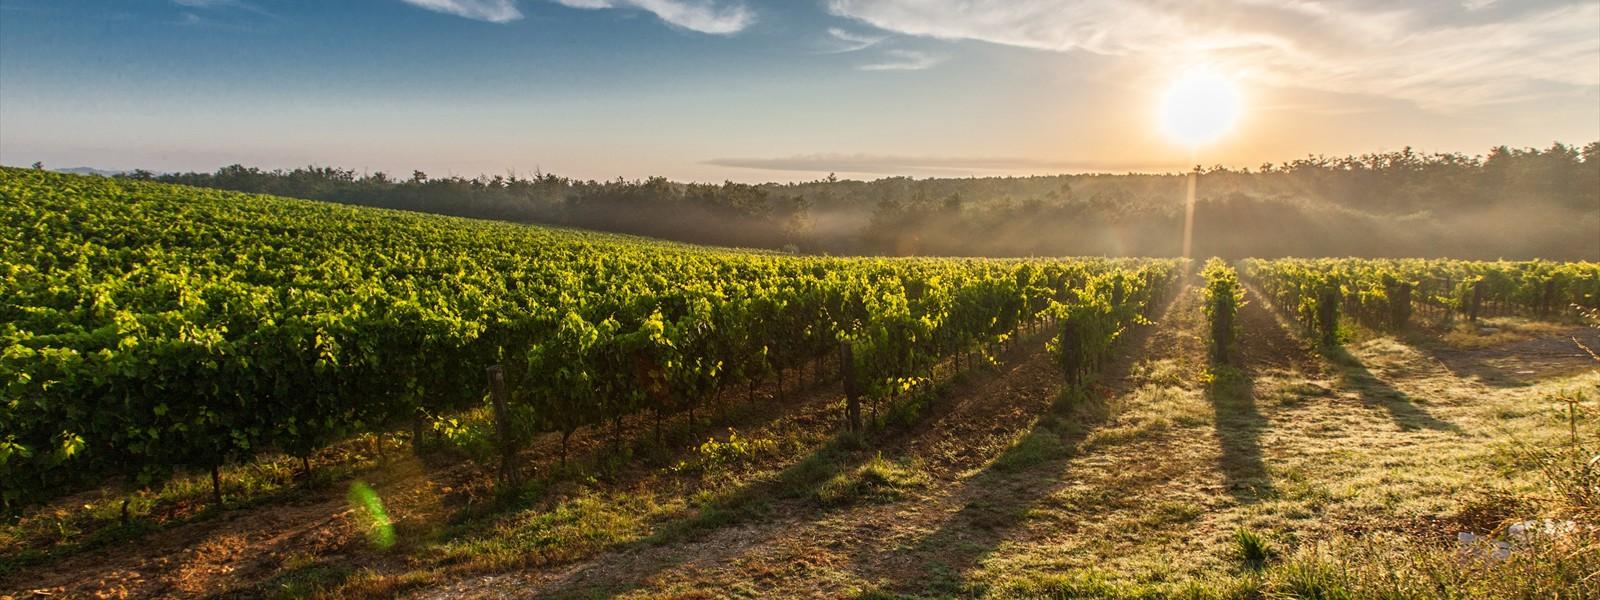 Grape field in Toscana : responsive carousel slider